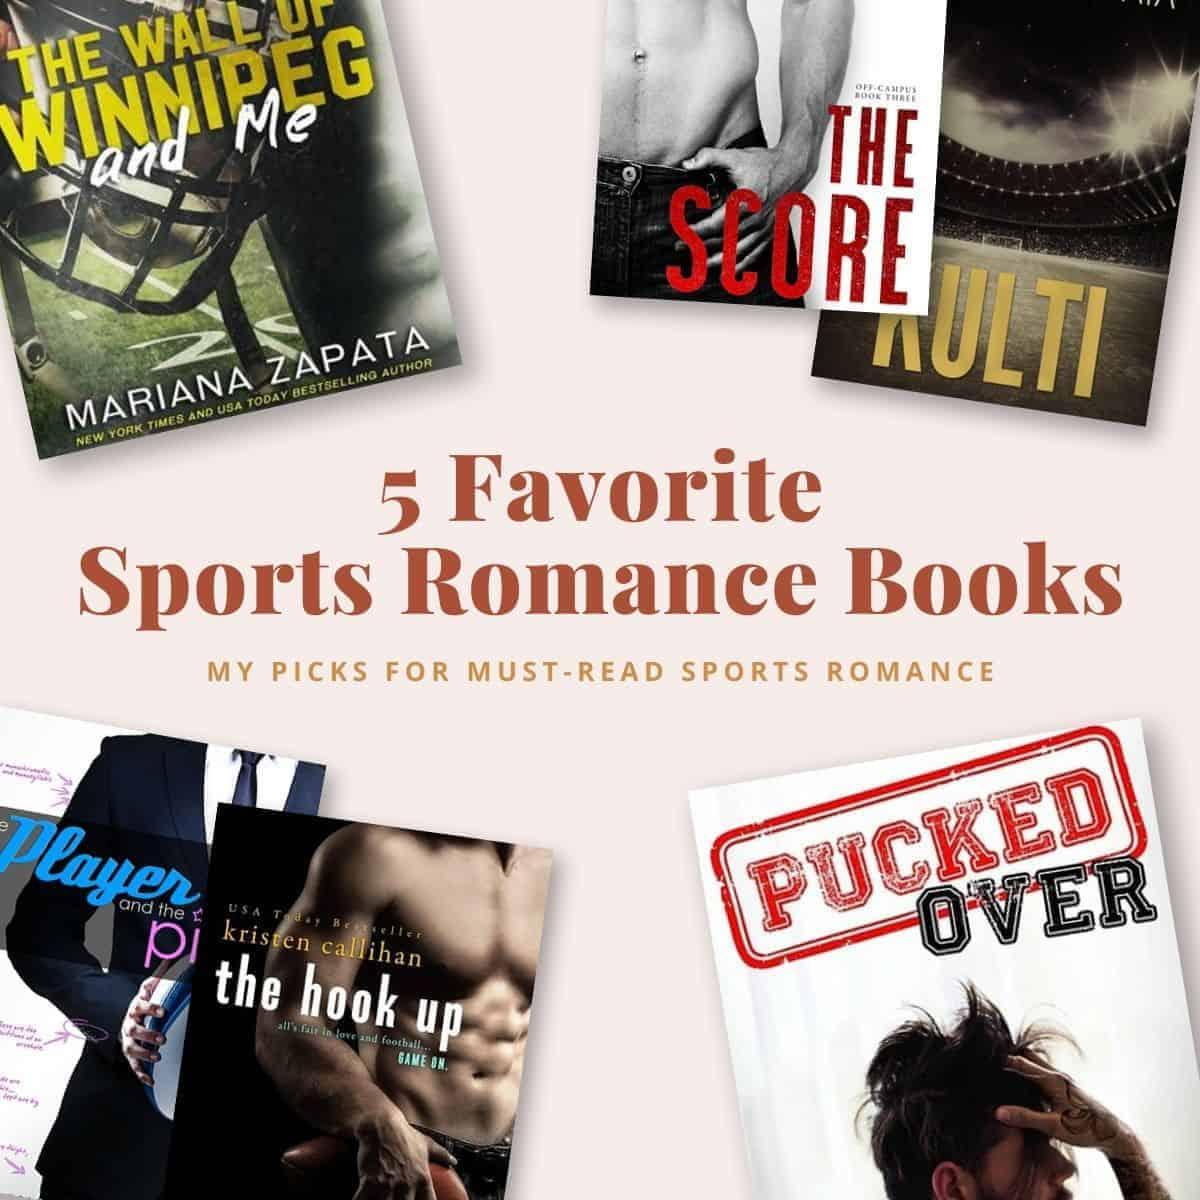 5 Favorite Sports Romance Books-featured